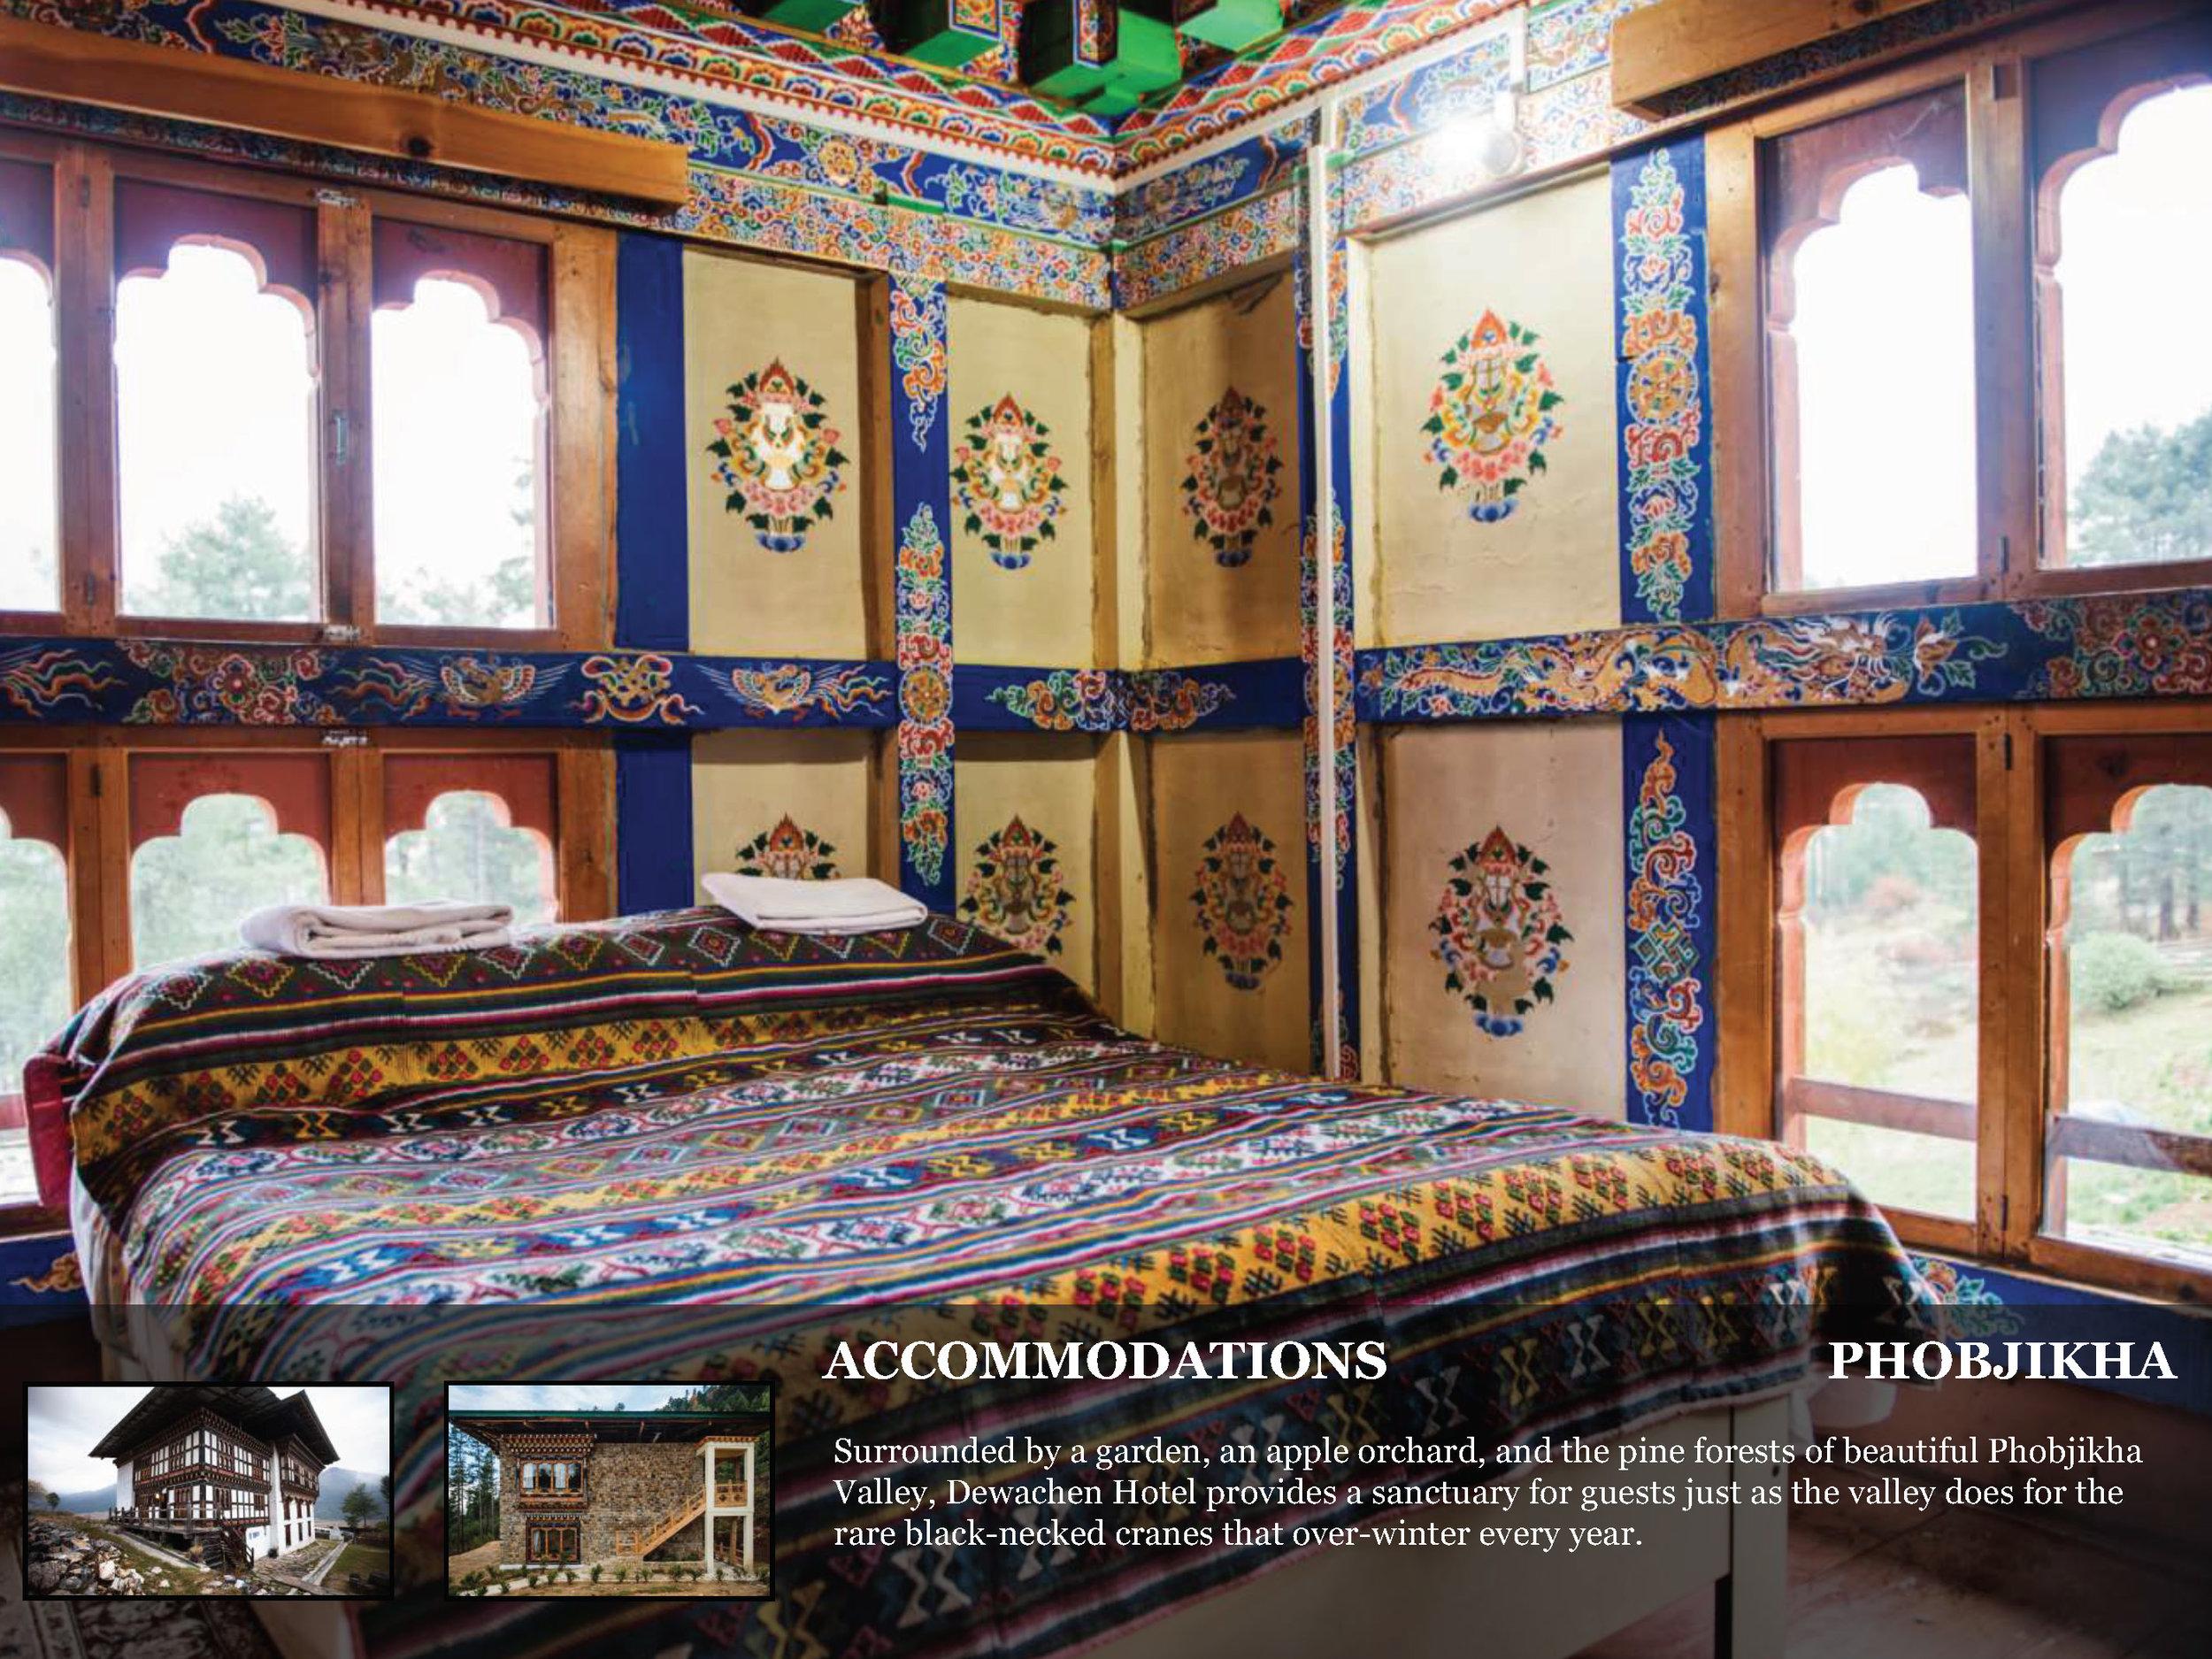 Bé_Bhutan_Page_24.jpg